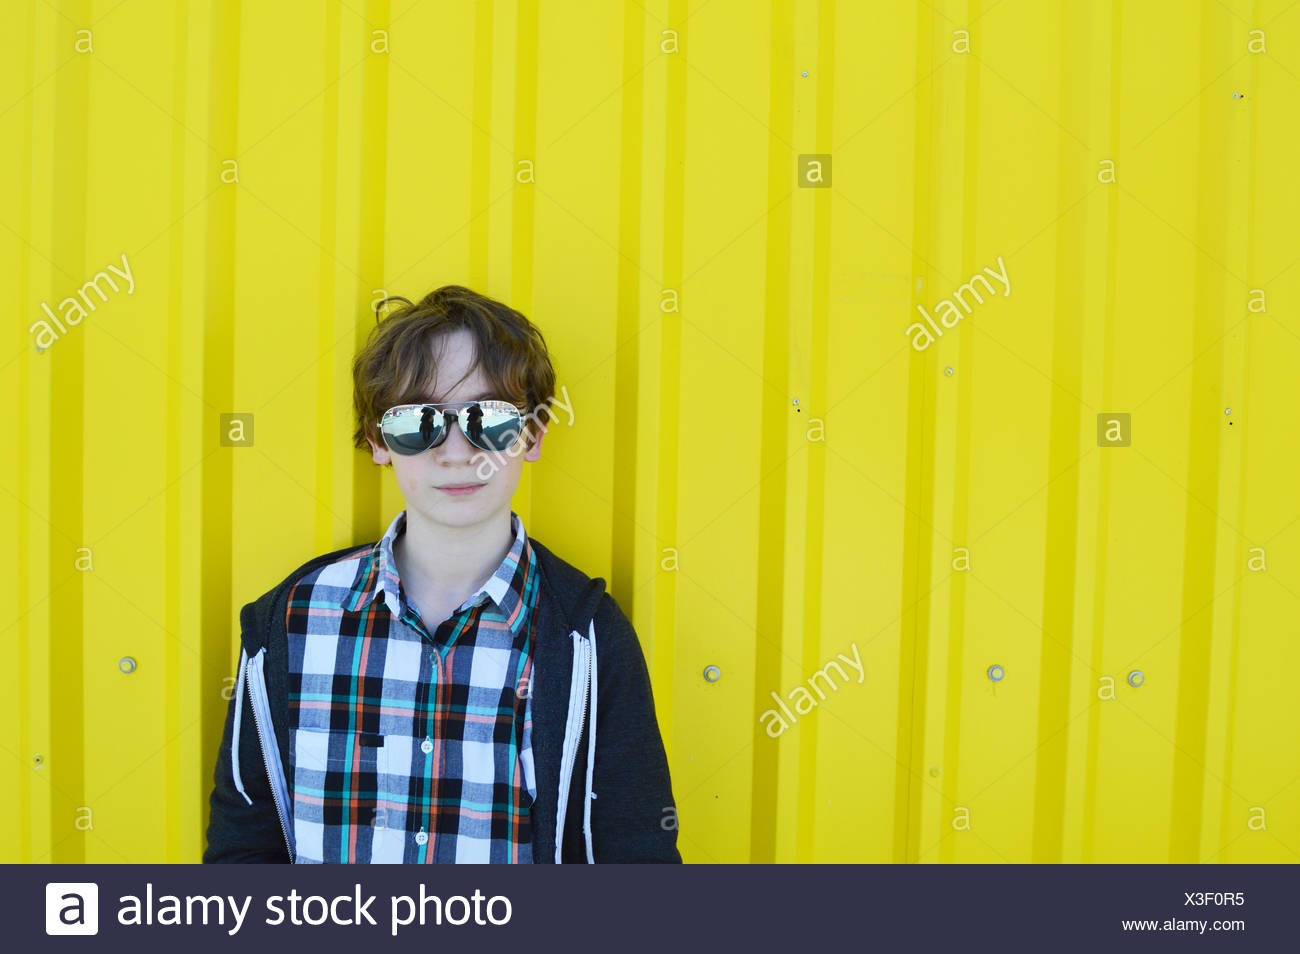 Boy (12-13) wearing sunglasses - Stock Image